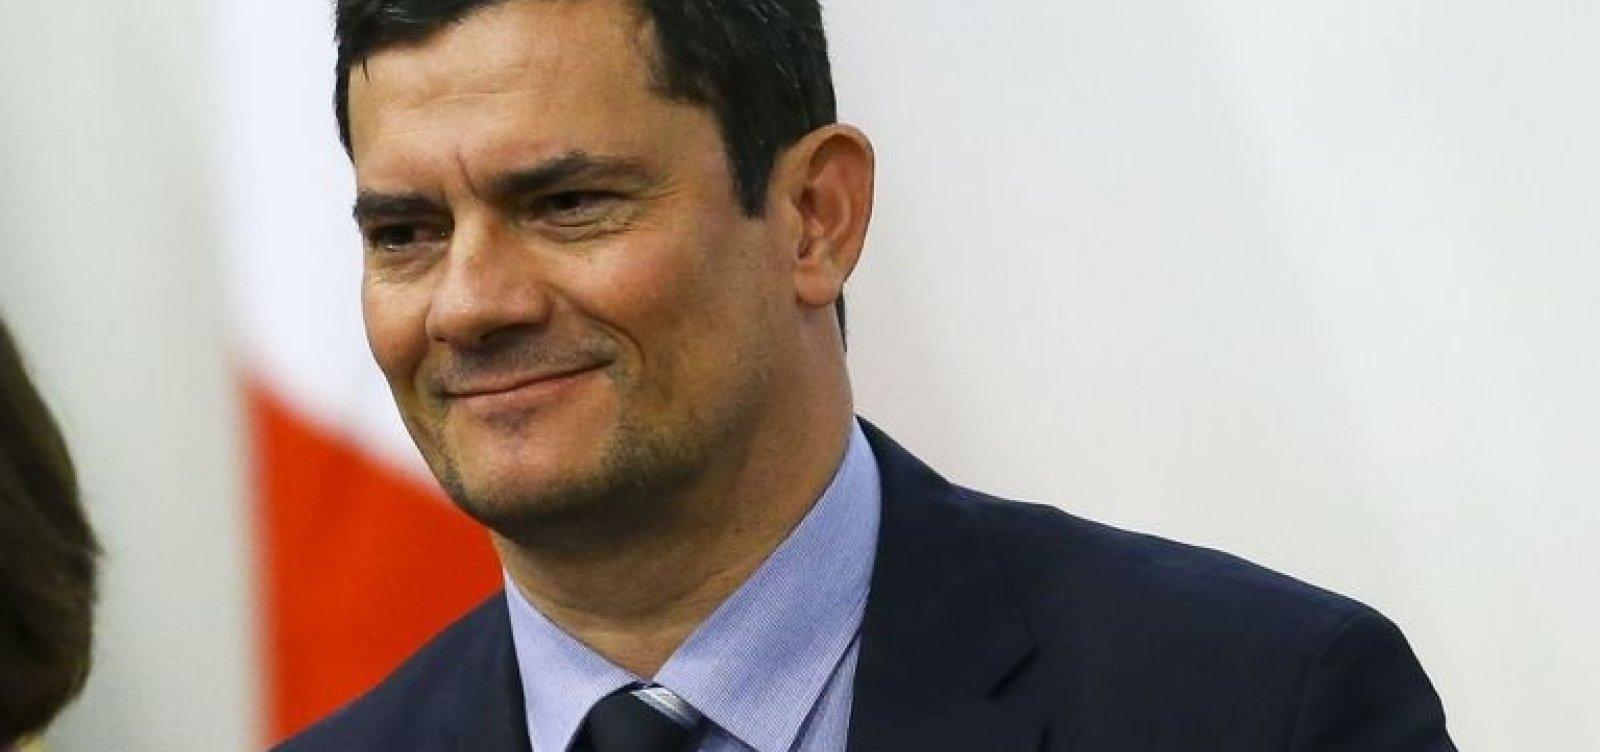 Moro diz que decreto sobre armas 'foi elaborado principalmente no Palácio do Planalto'